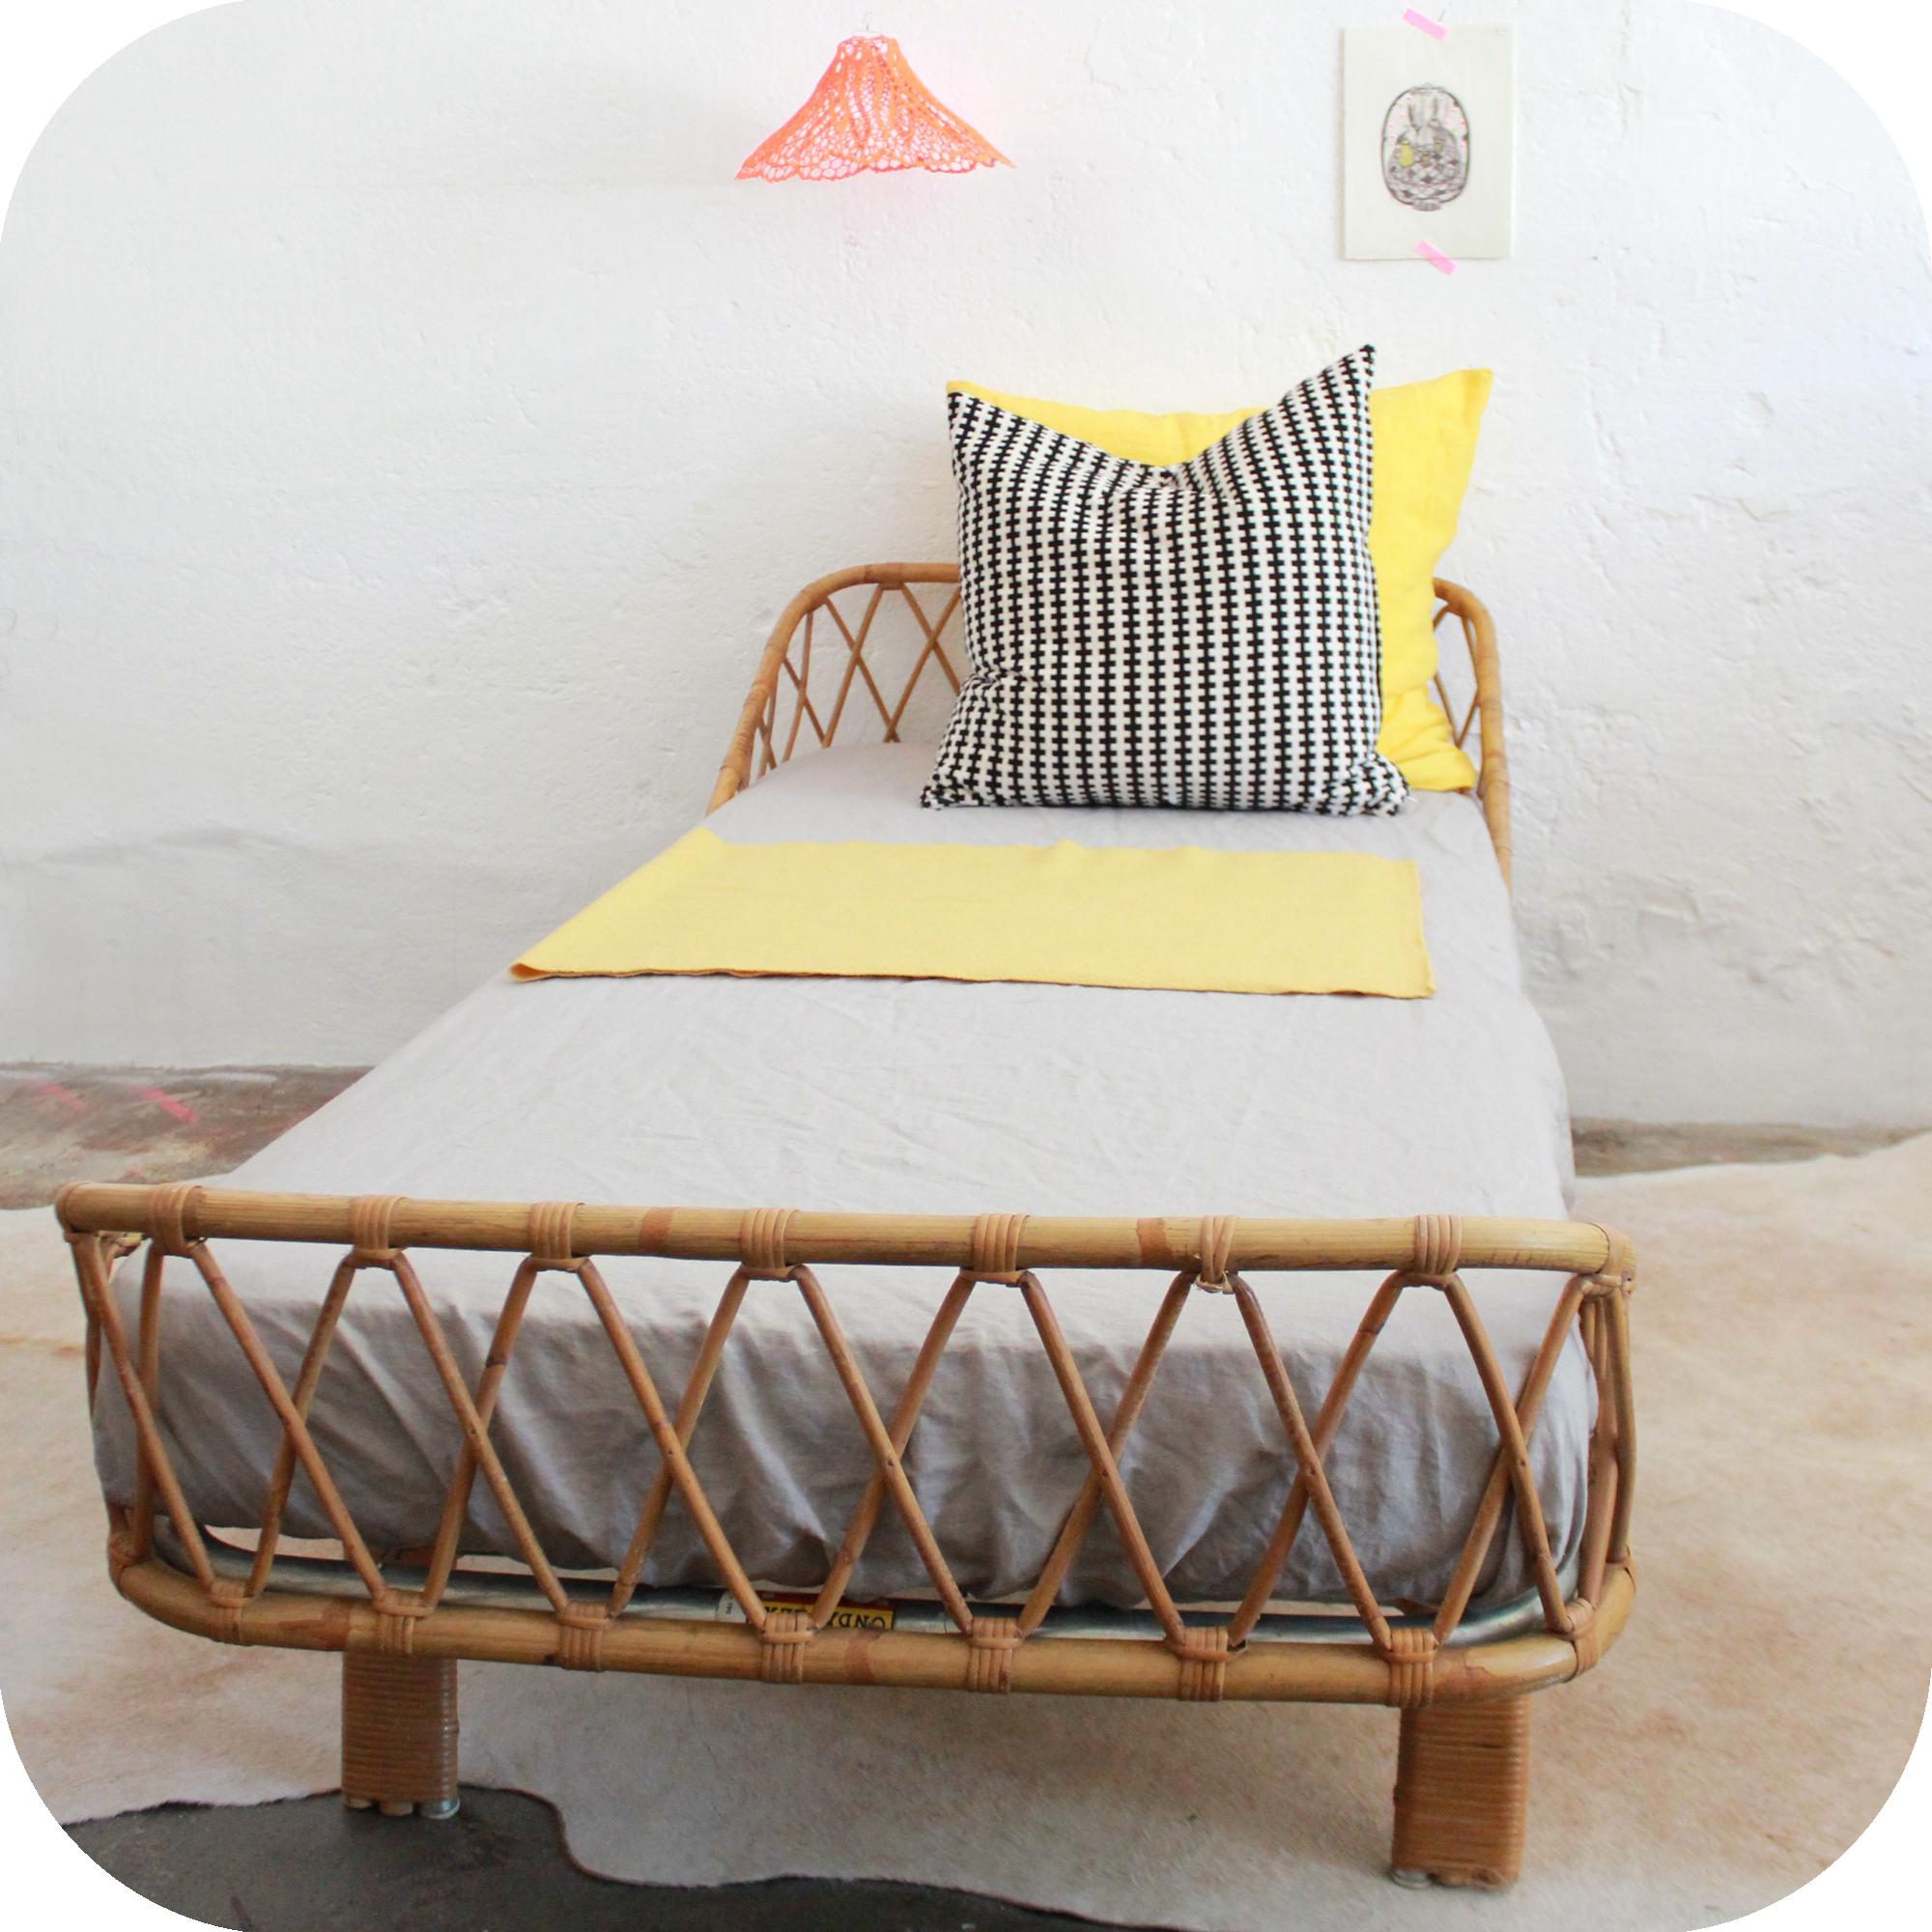 pin lit rotin vintage on pinterest. Black Bedroom Furniture Sets. Home Design Ideas